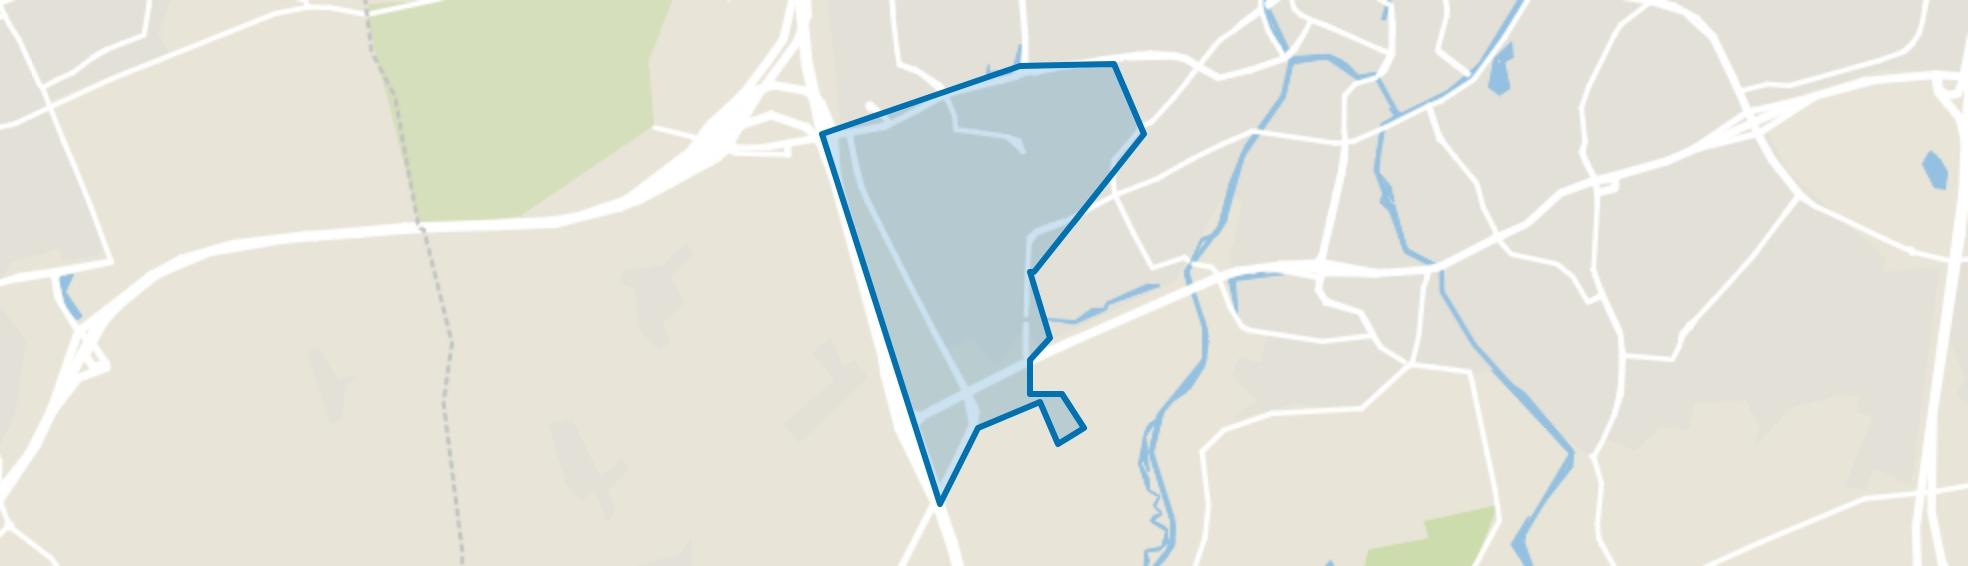 Princenhage, Breda map